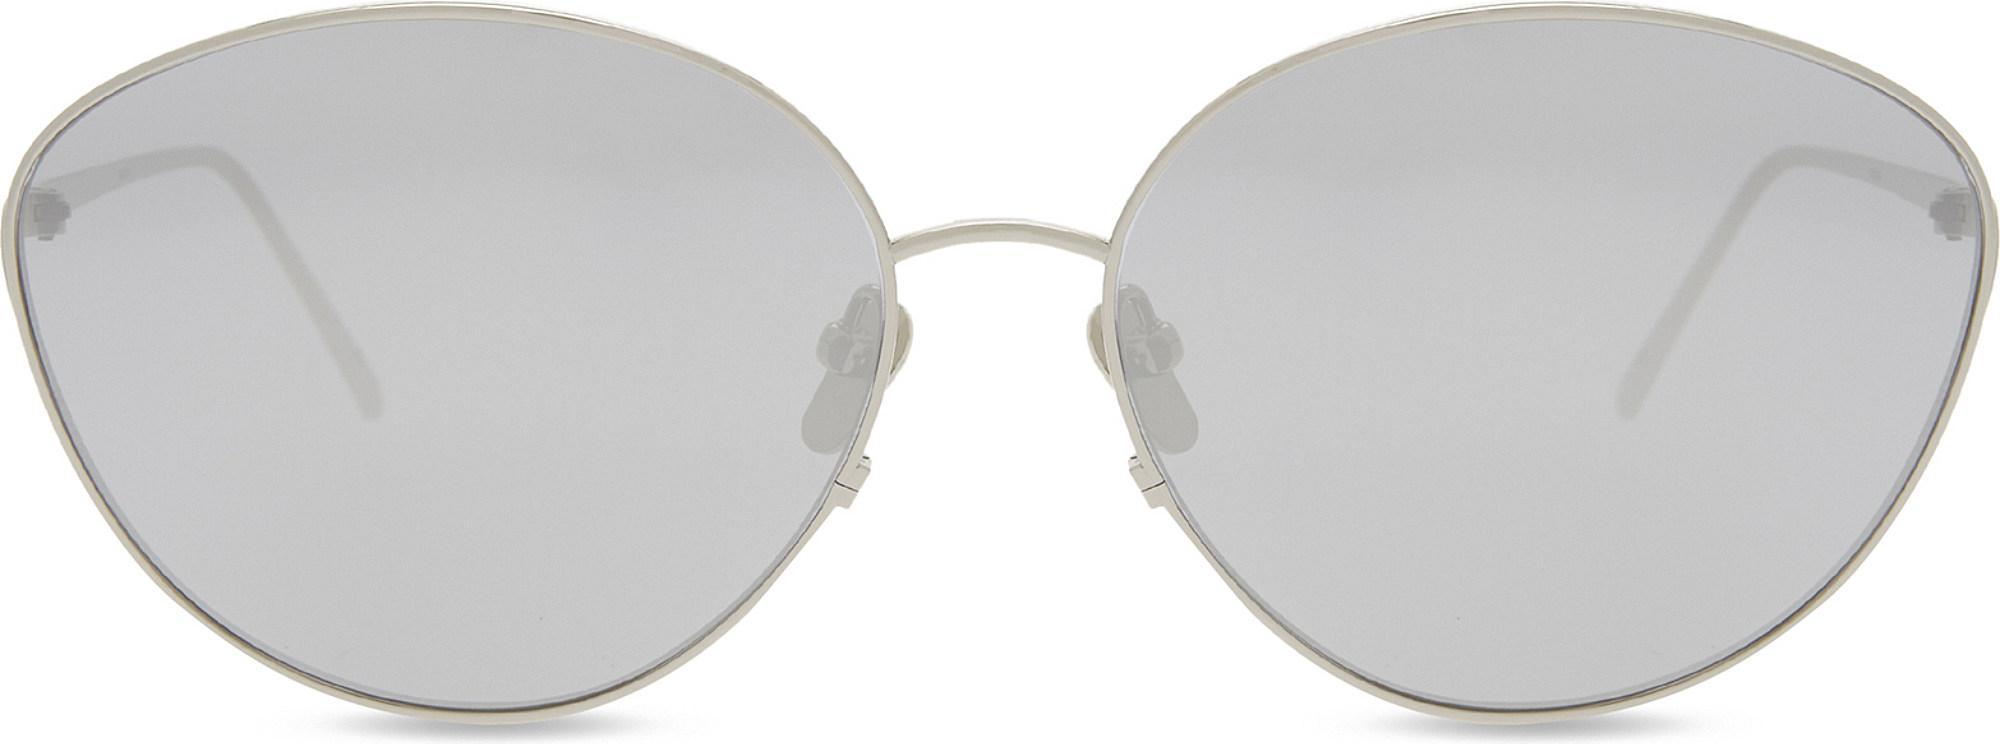 73d3dc30284 Linda Farrow Lfl508 Cat-eye Sunglasses in White - Lyst